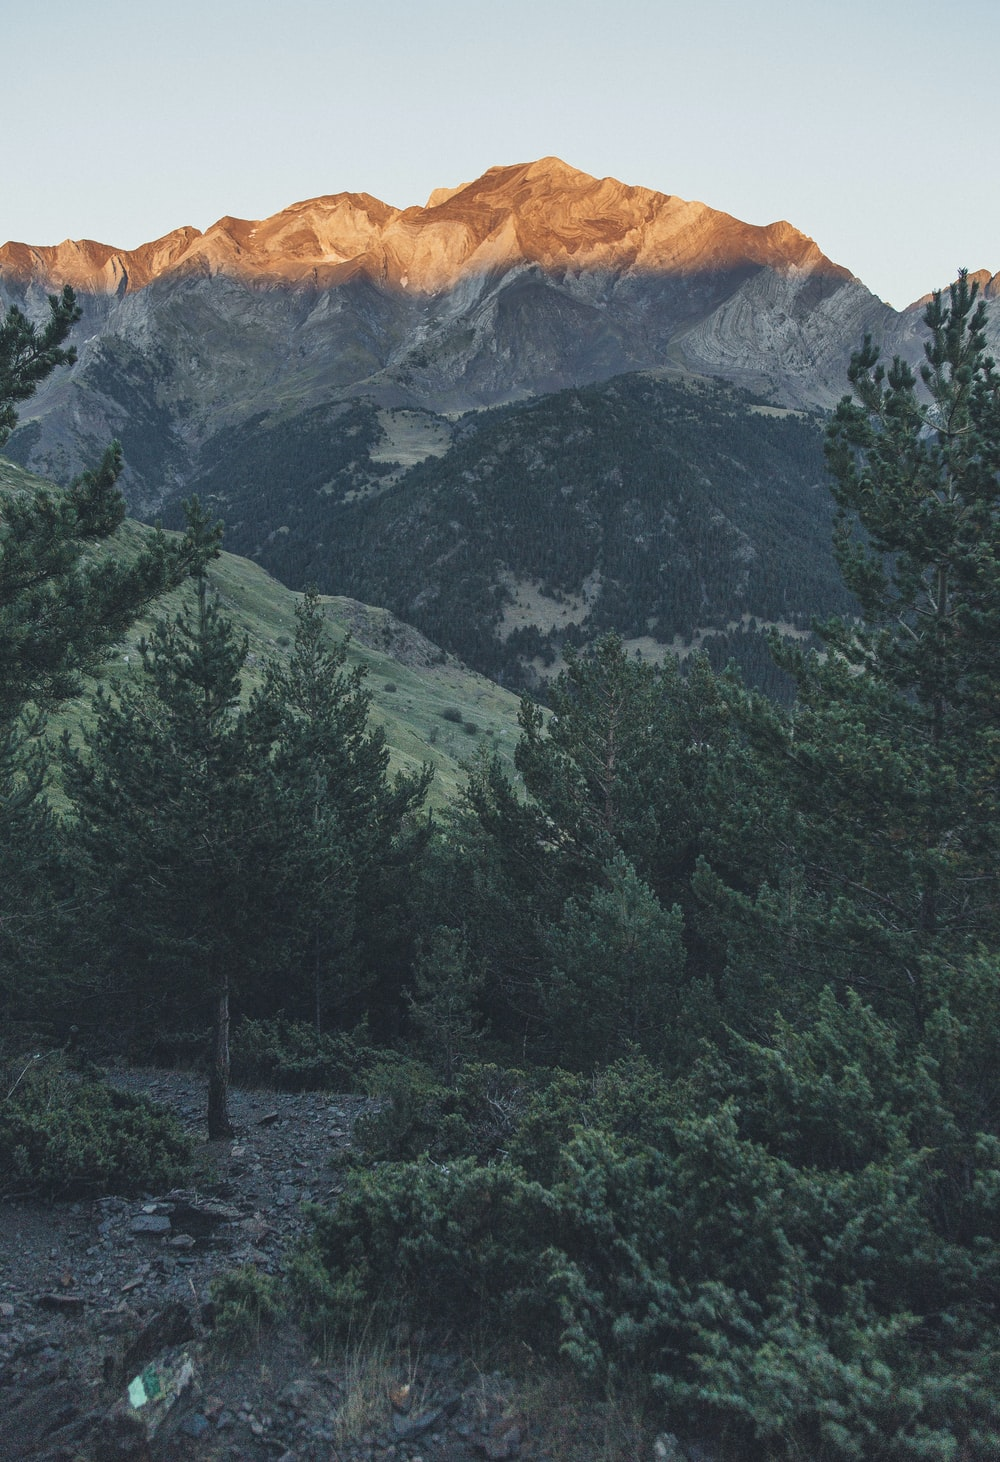 green leafed trees near mountain during daytim